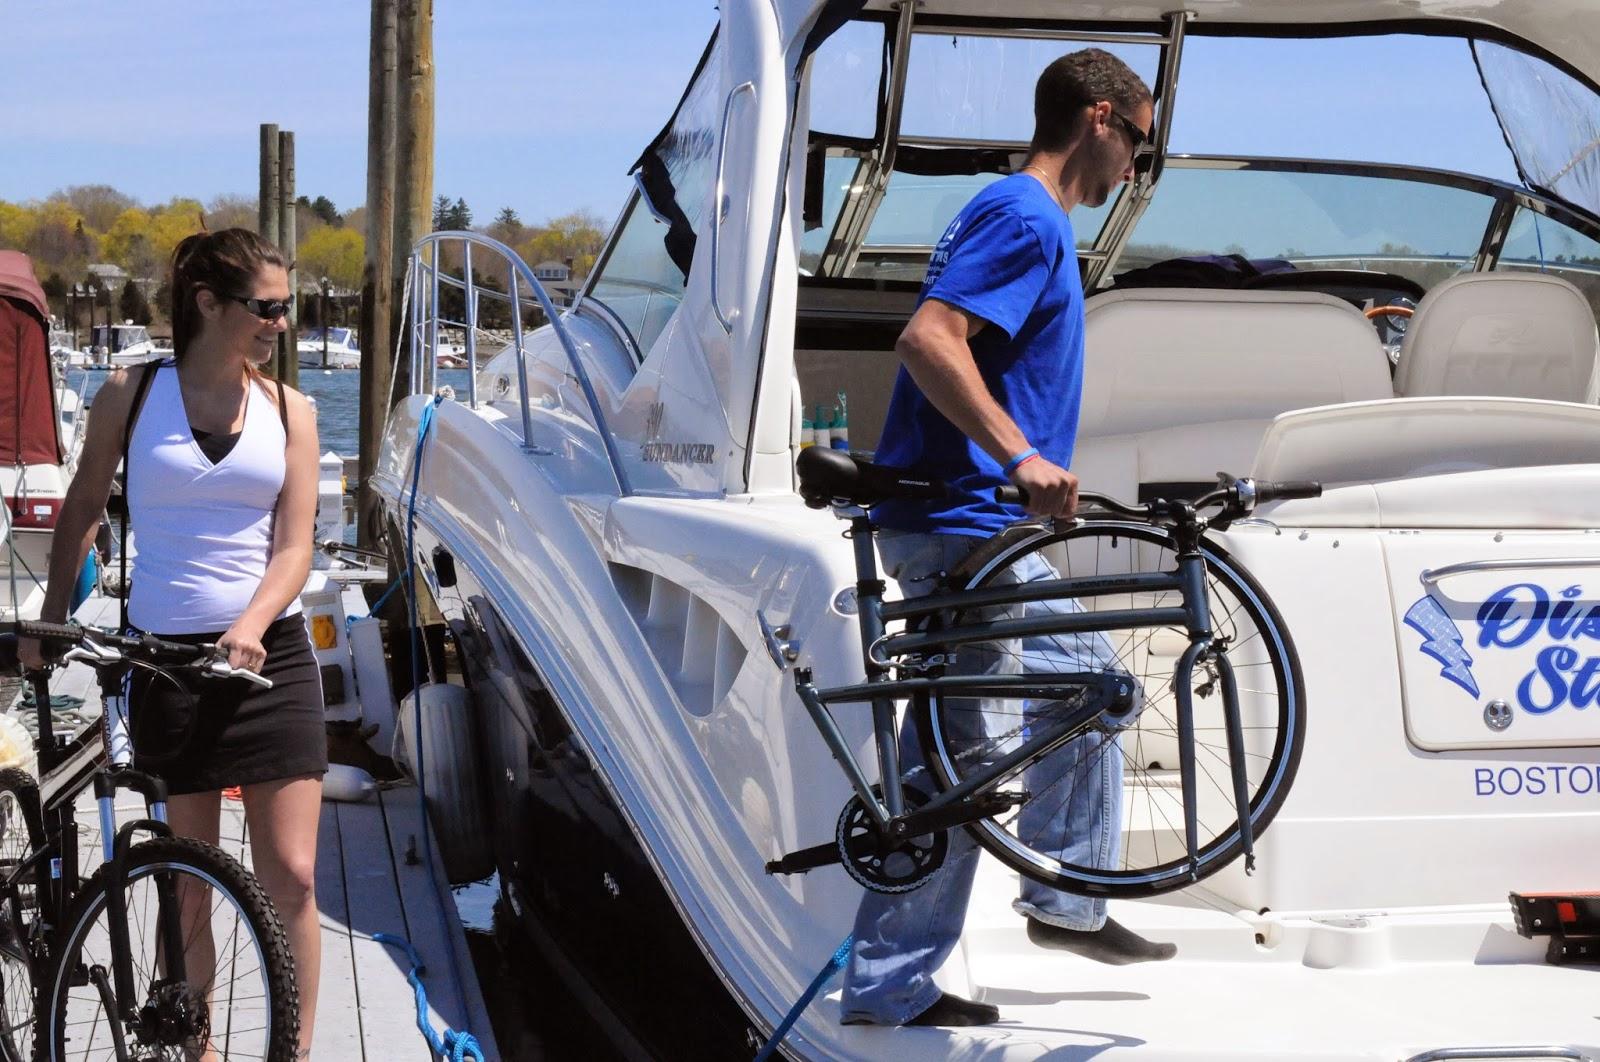 folding bikes on boats